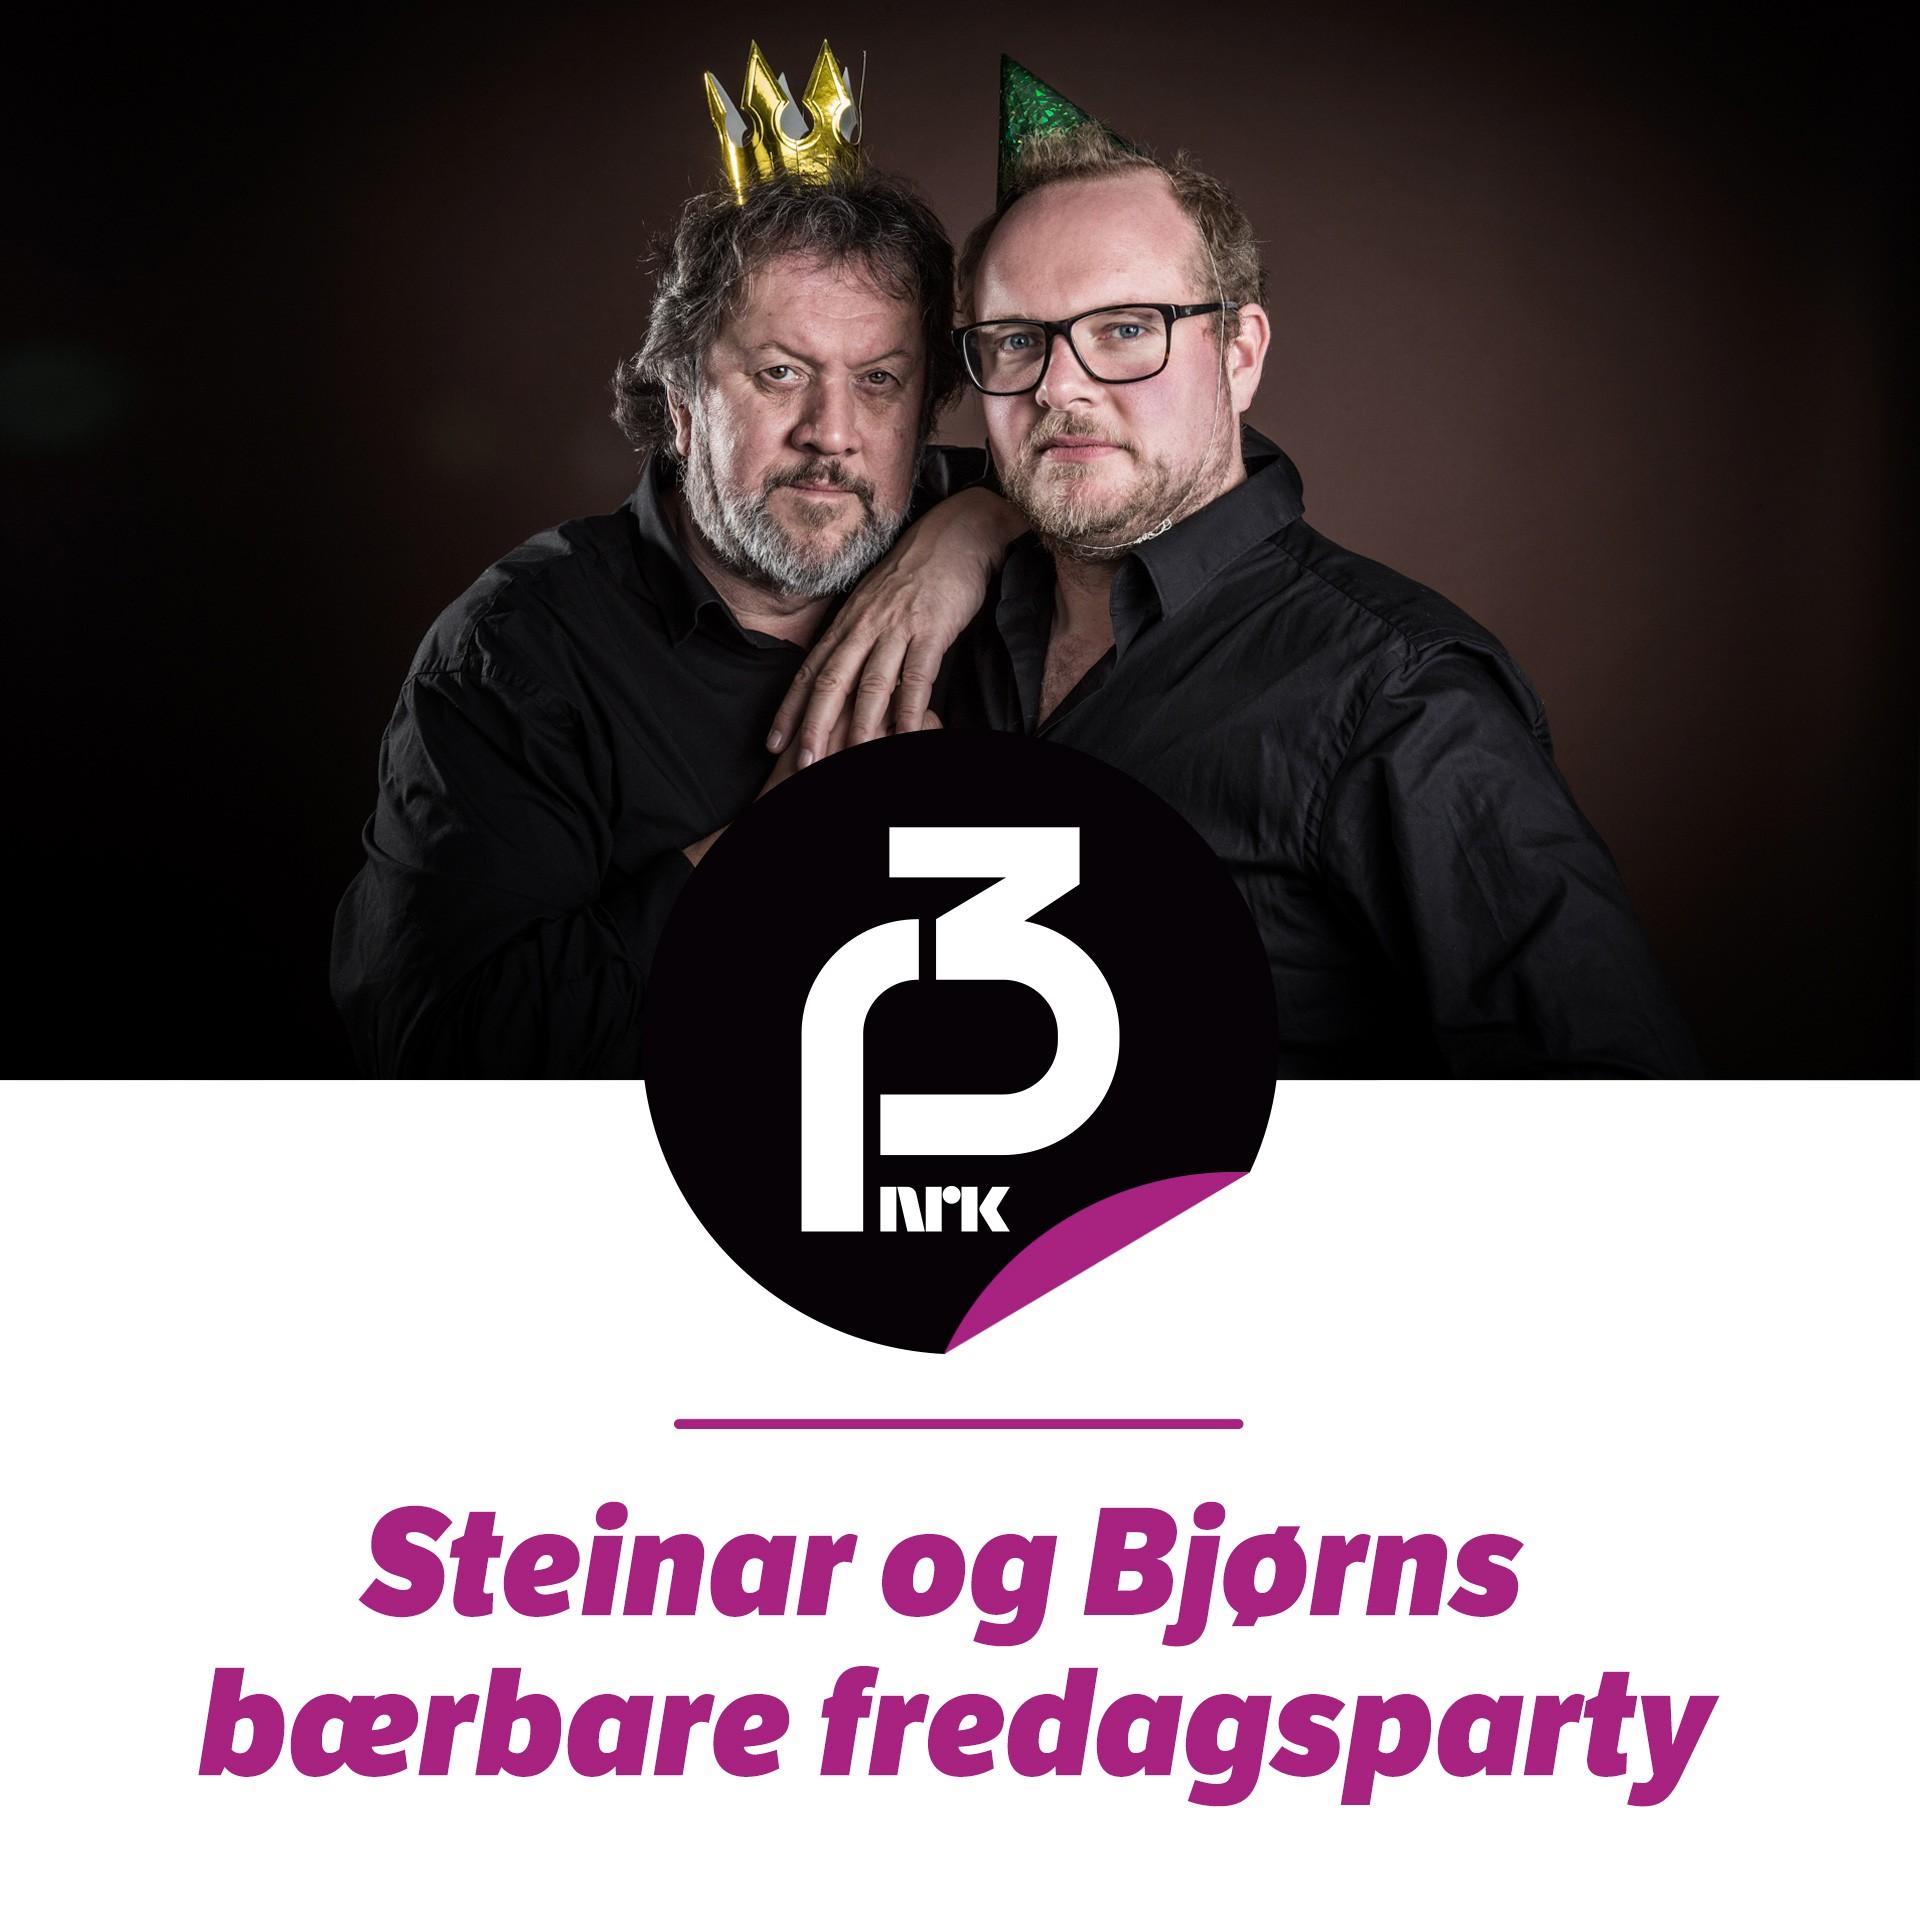 Steinar og Bjørns bærbare fredagsparty